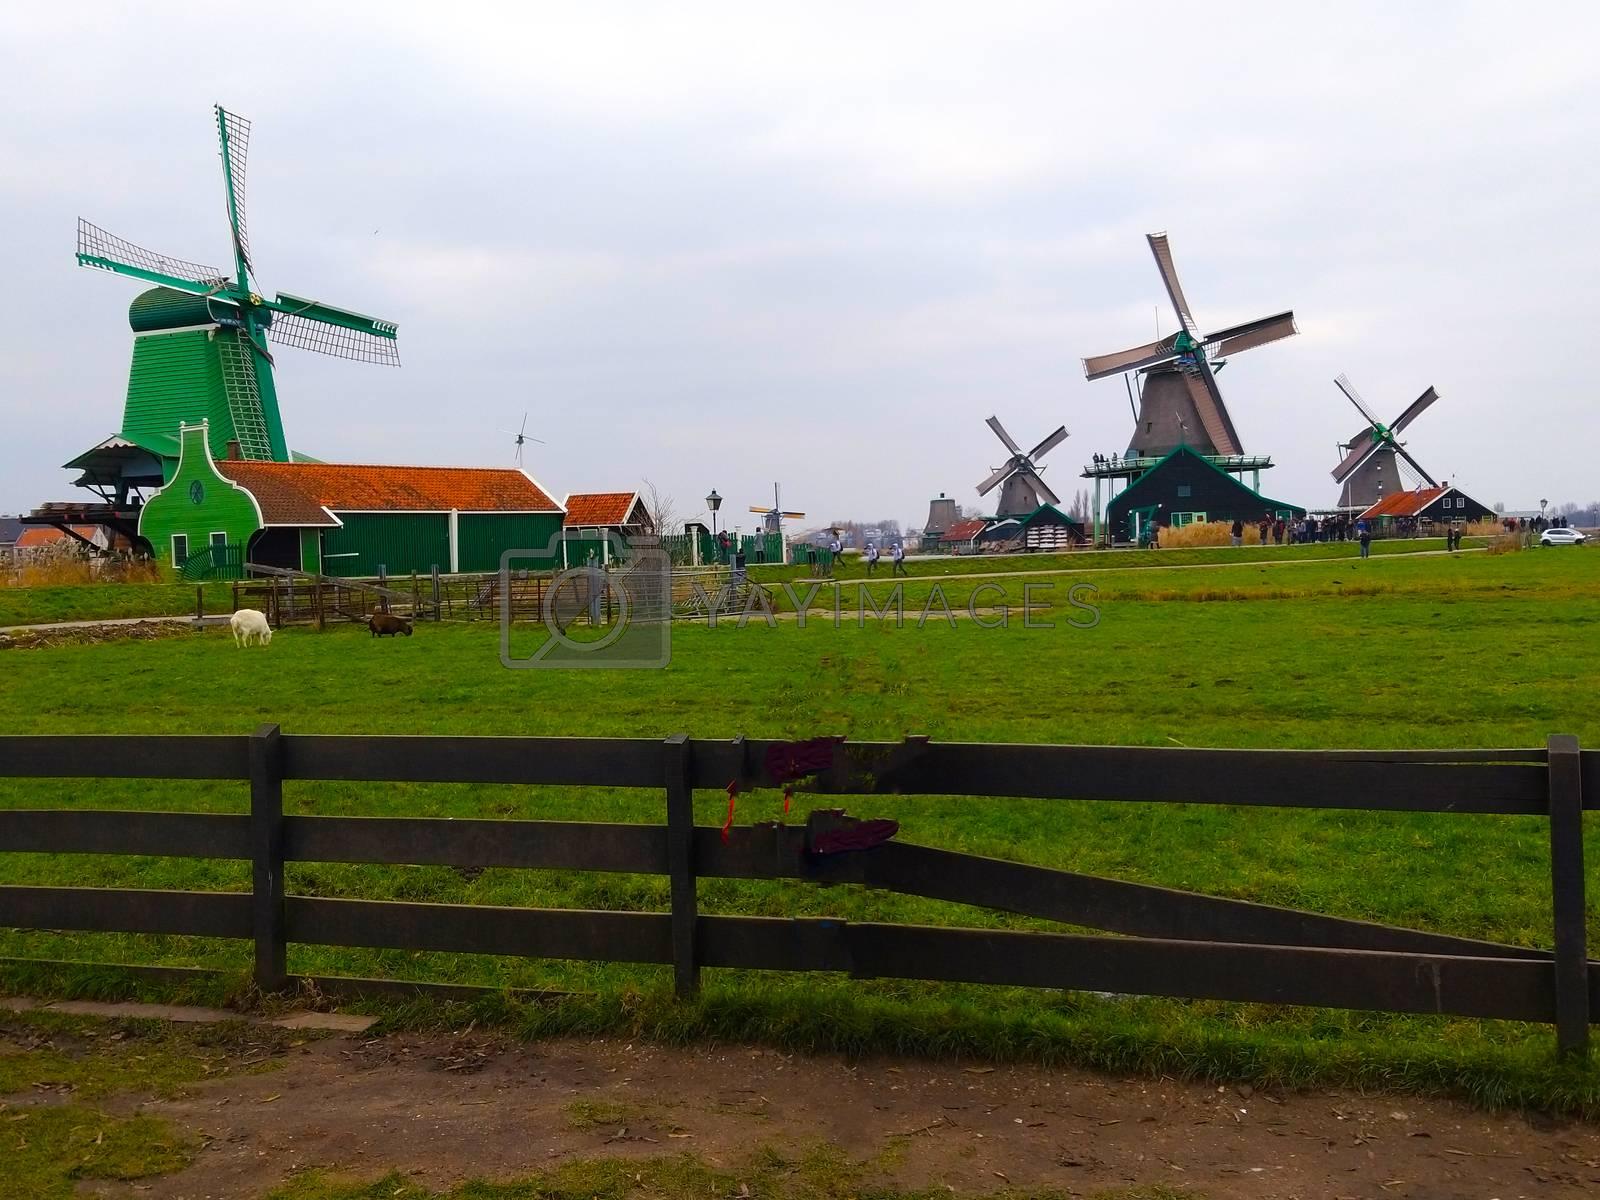 a rural scene of a dutch farm